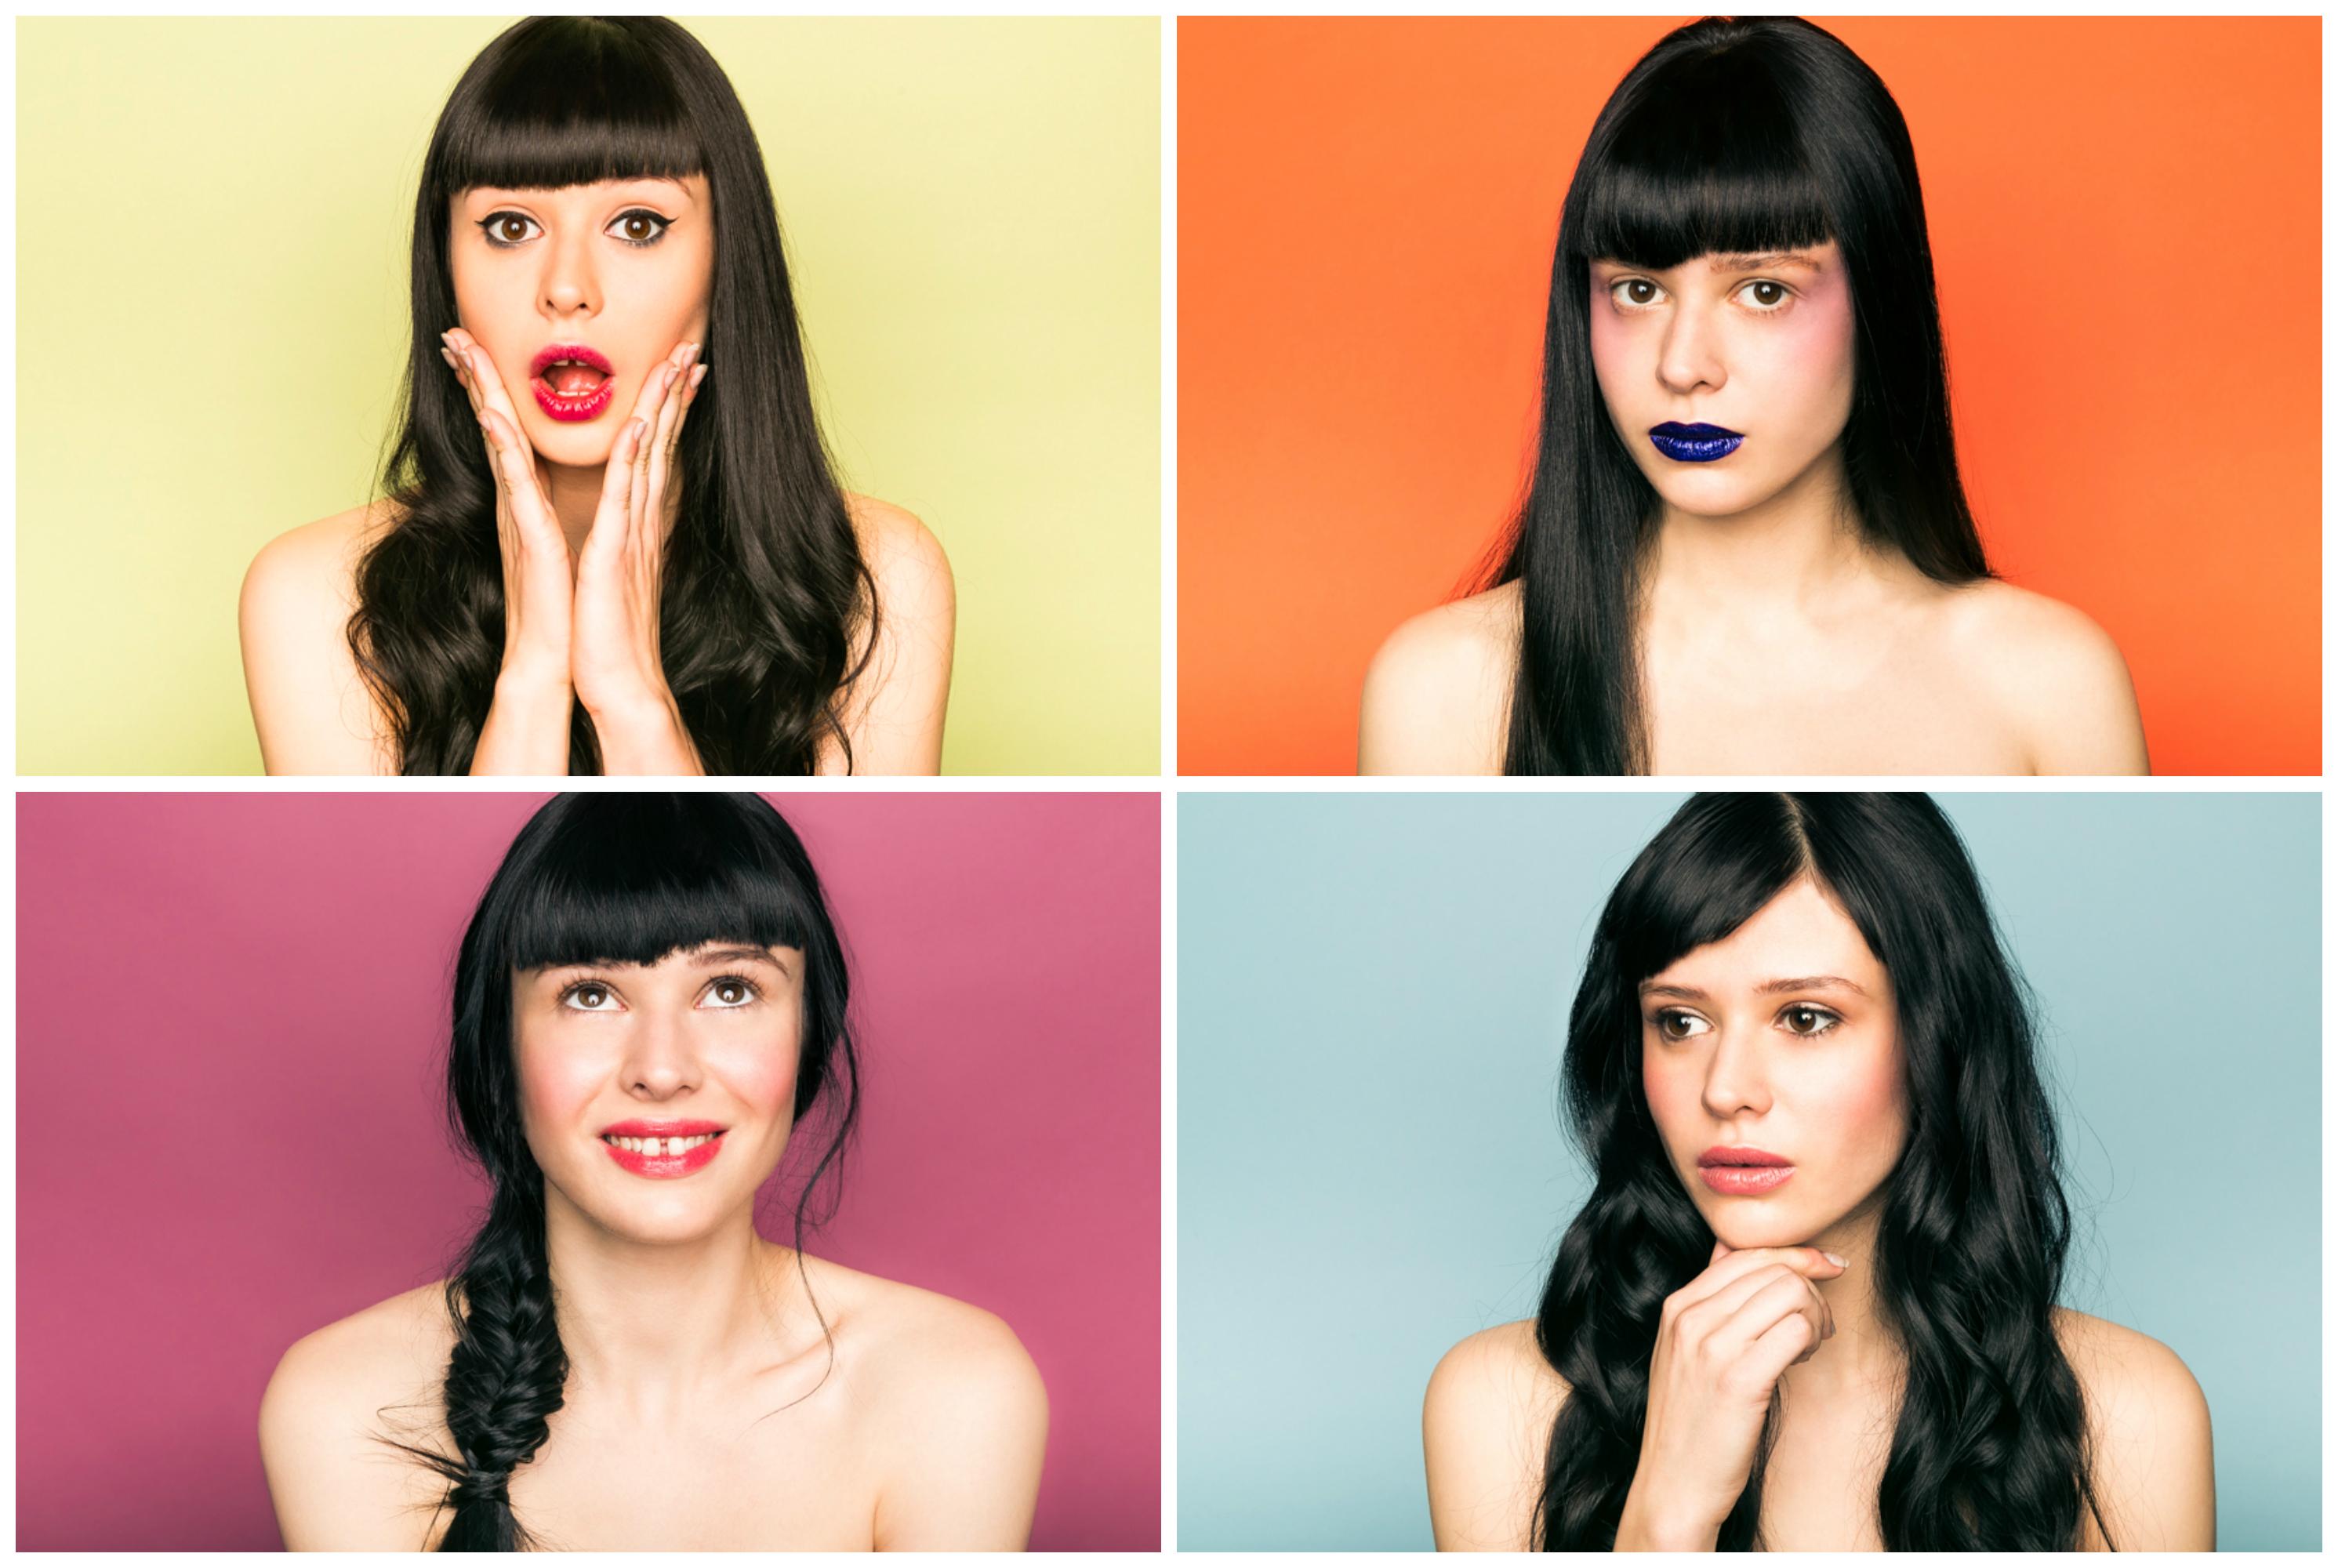 "Photo: <a href=""http://drielys.com"">Driely S.</a> for Racked; Model: Masha Korchagina"